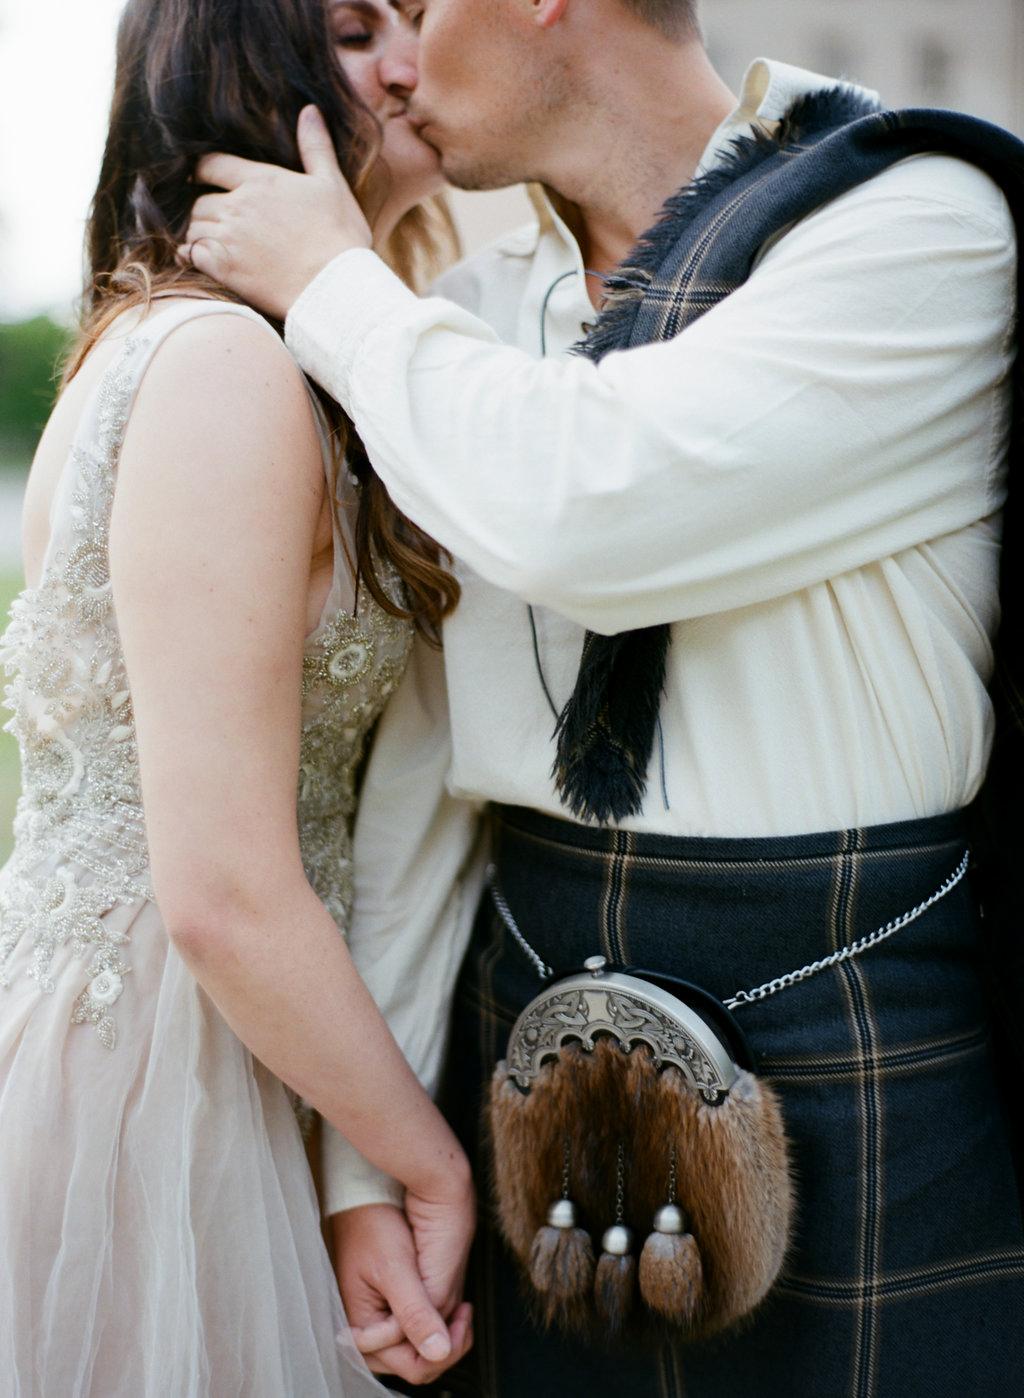 Scotland-Prewedding-highlands-castle-Engagment-Photos-Katie-Grant (39 of 139).jpg